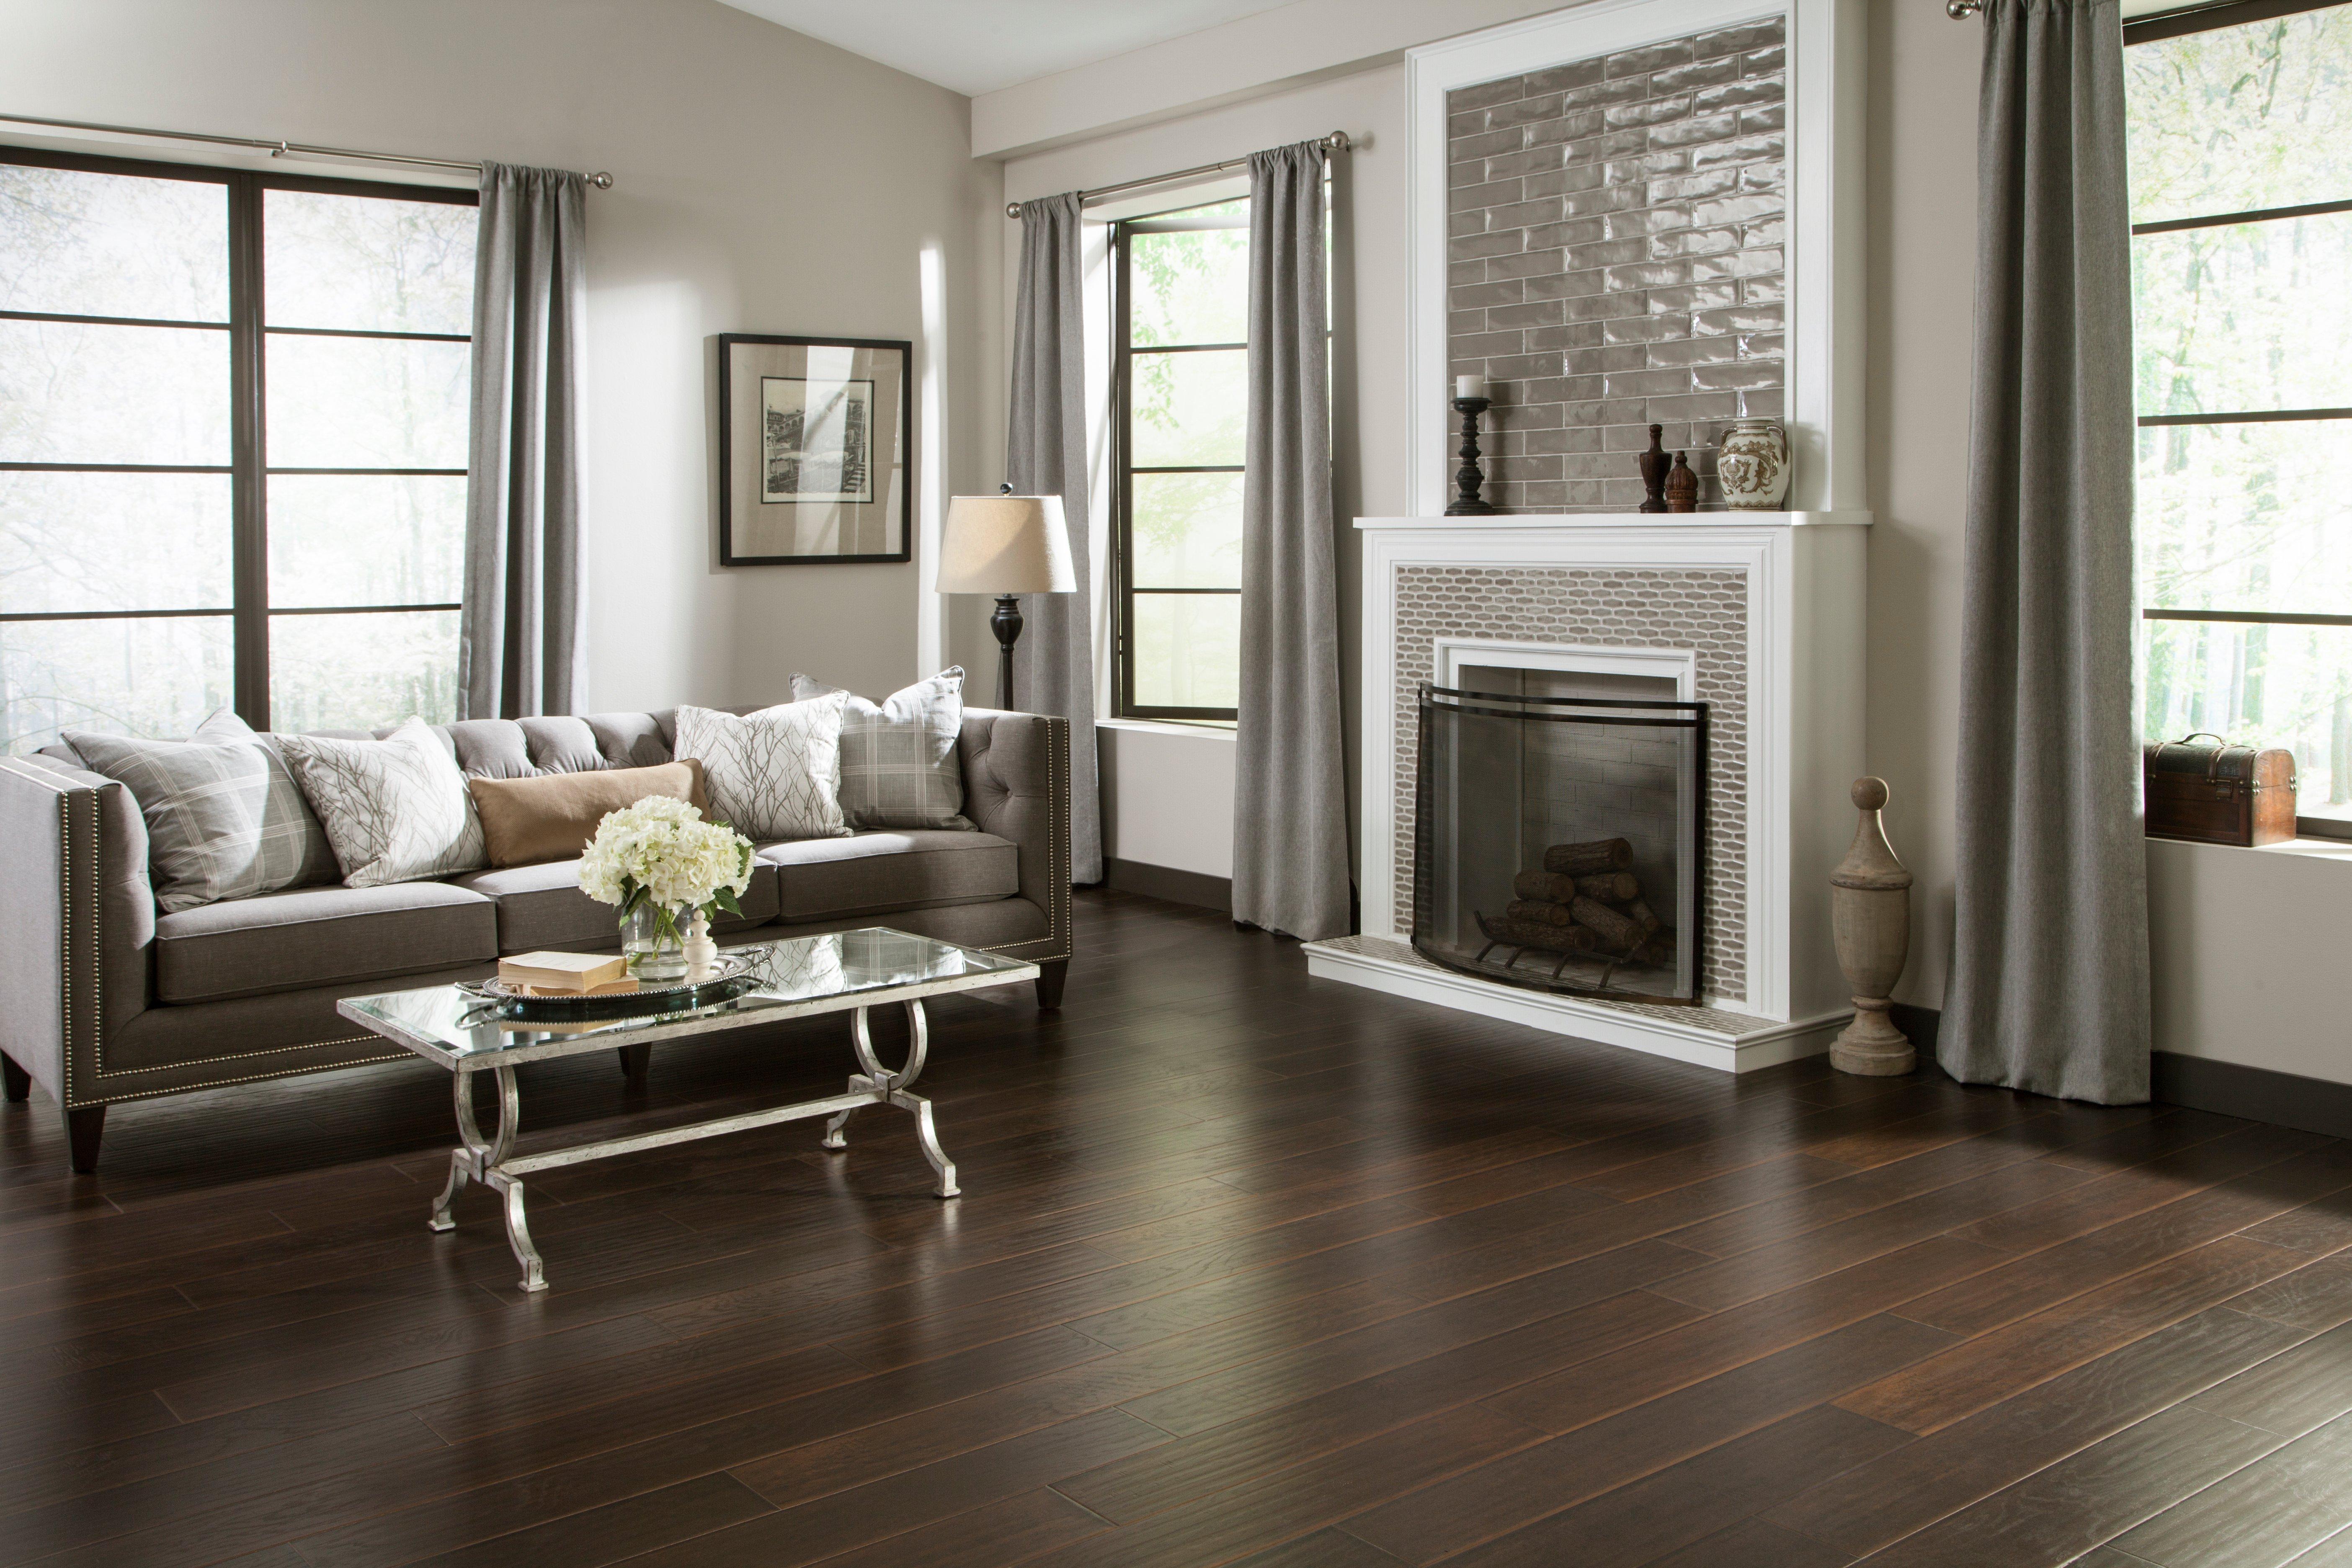 100 Floor And Home Decor Flooring America Shop Home